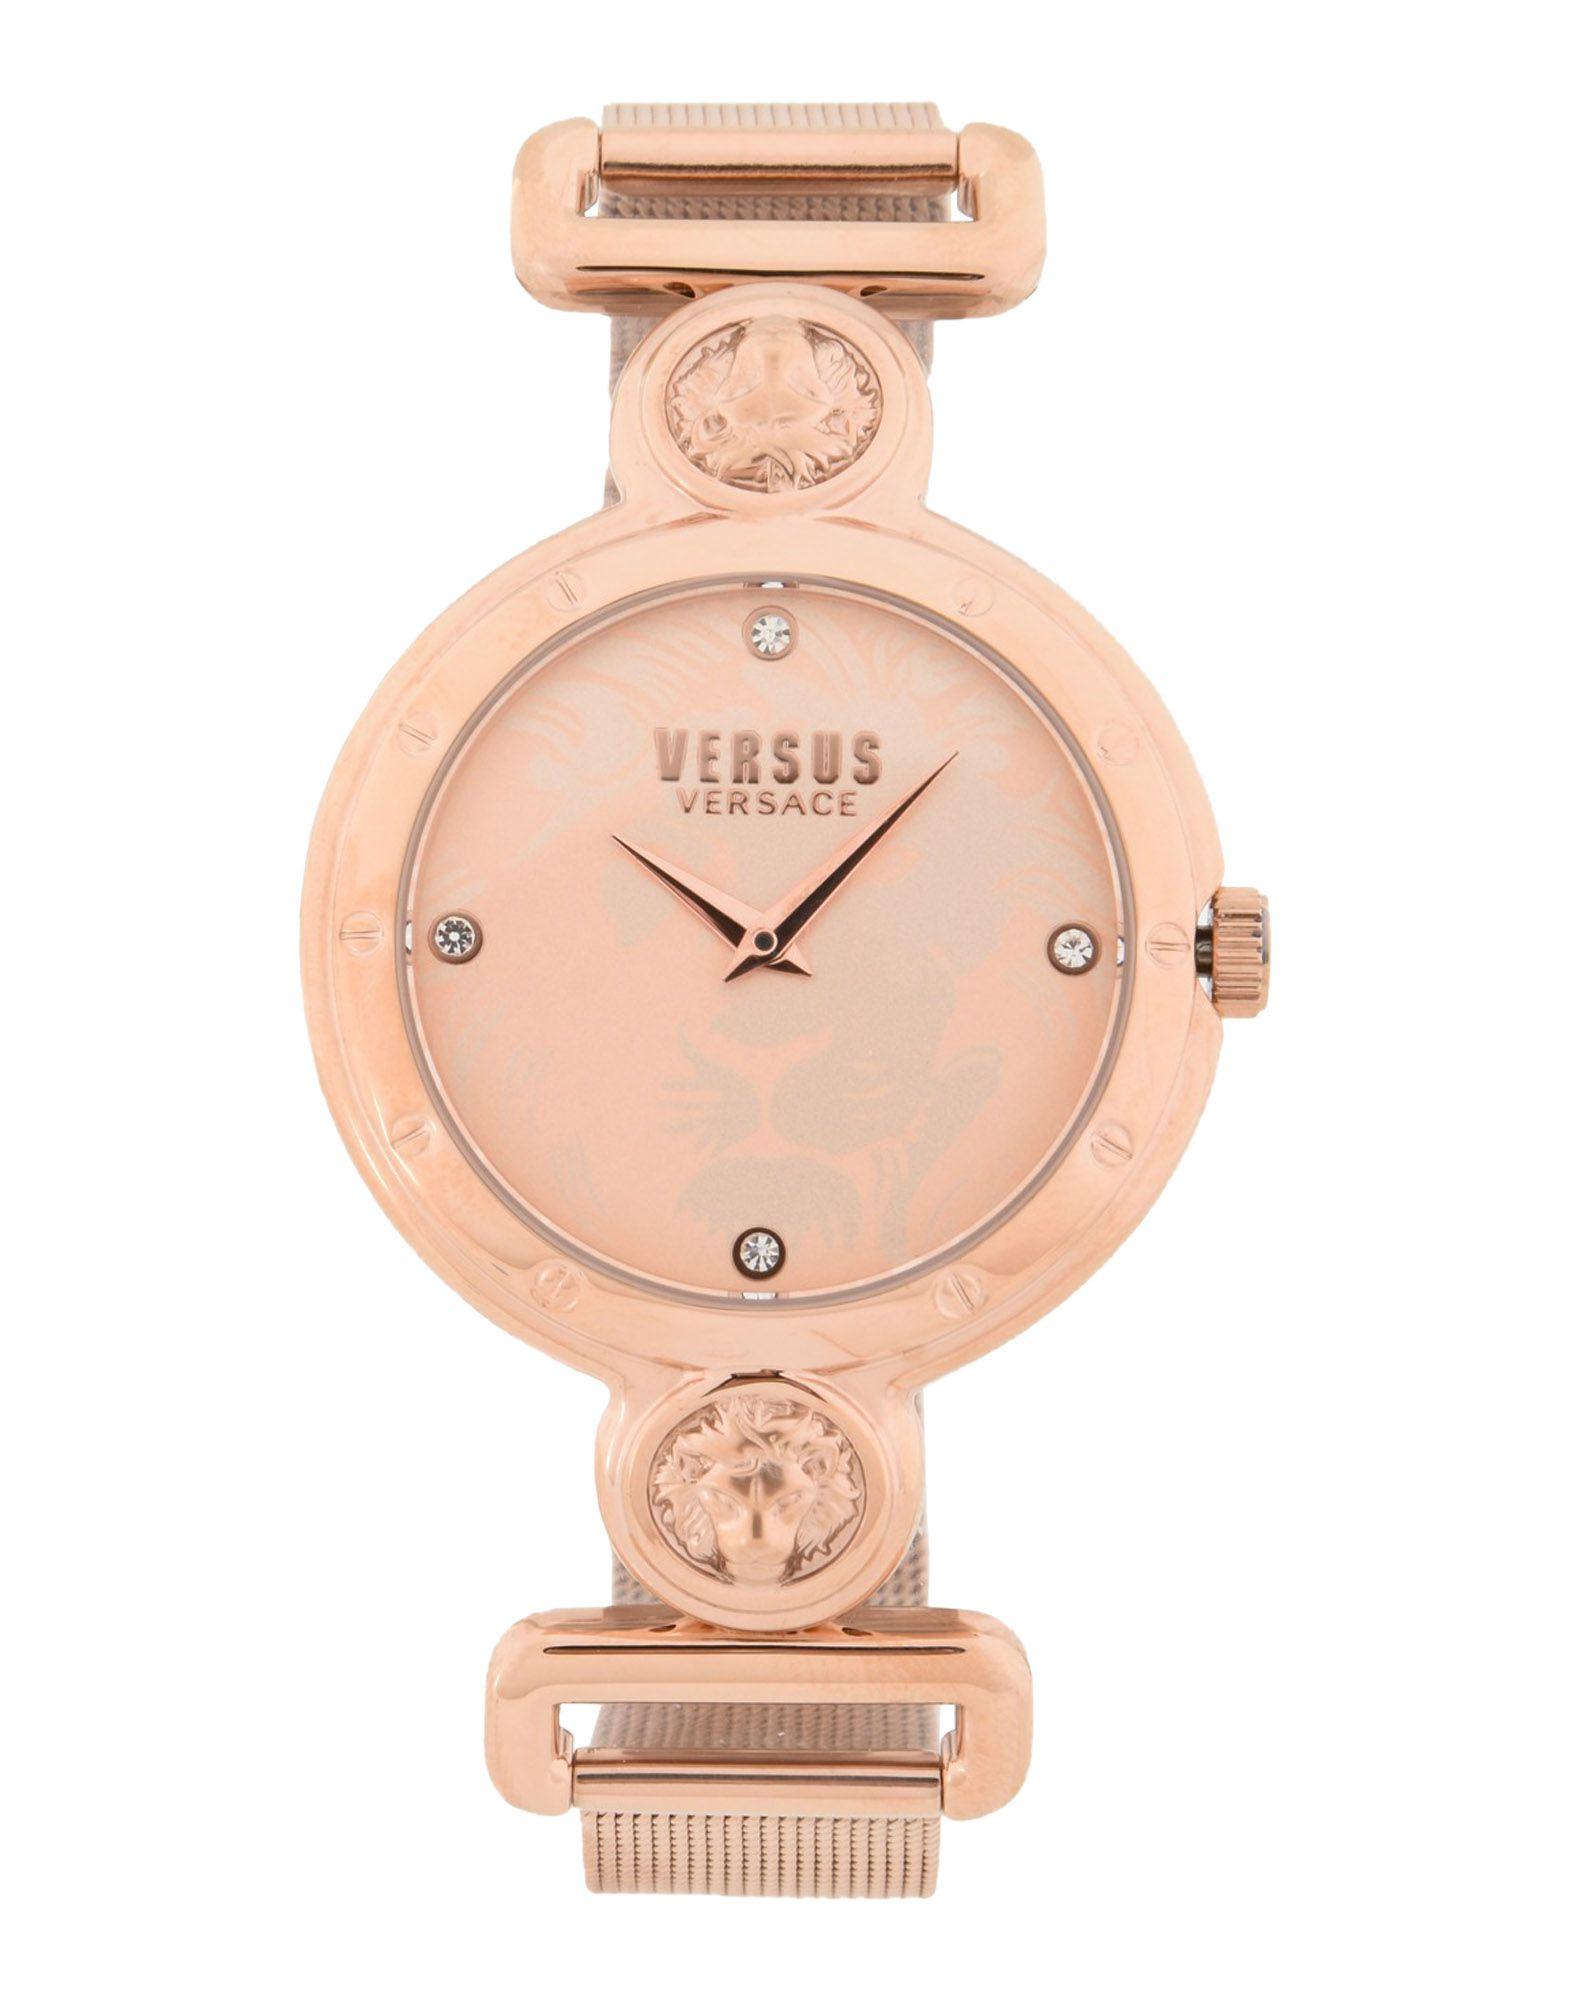 Orologio Da Polso Versus Versace Sunnyridge - Donna - Acquista online su